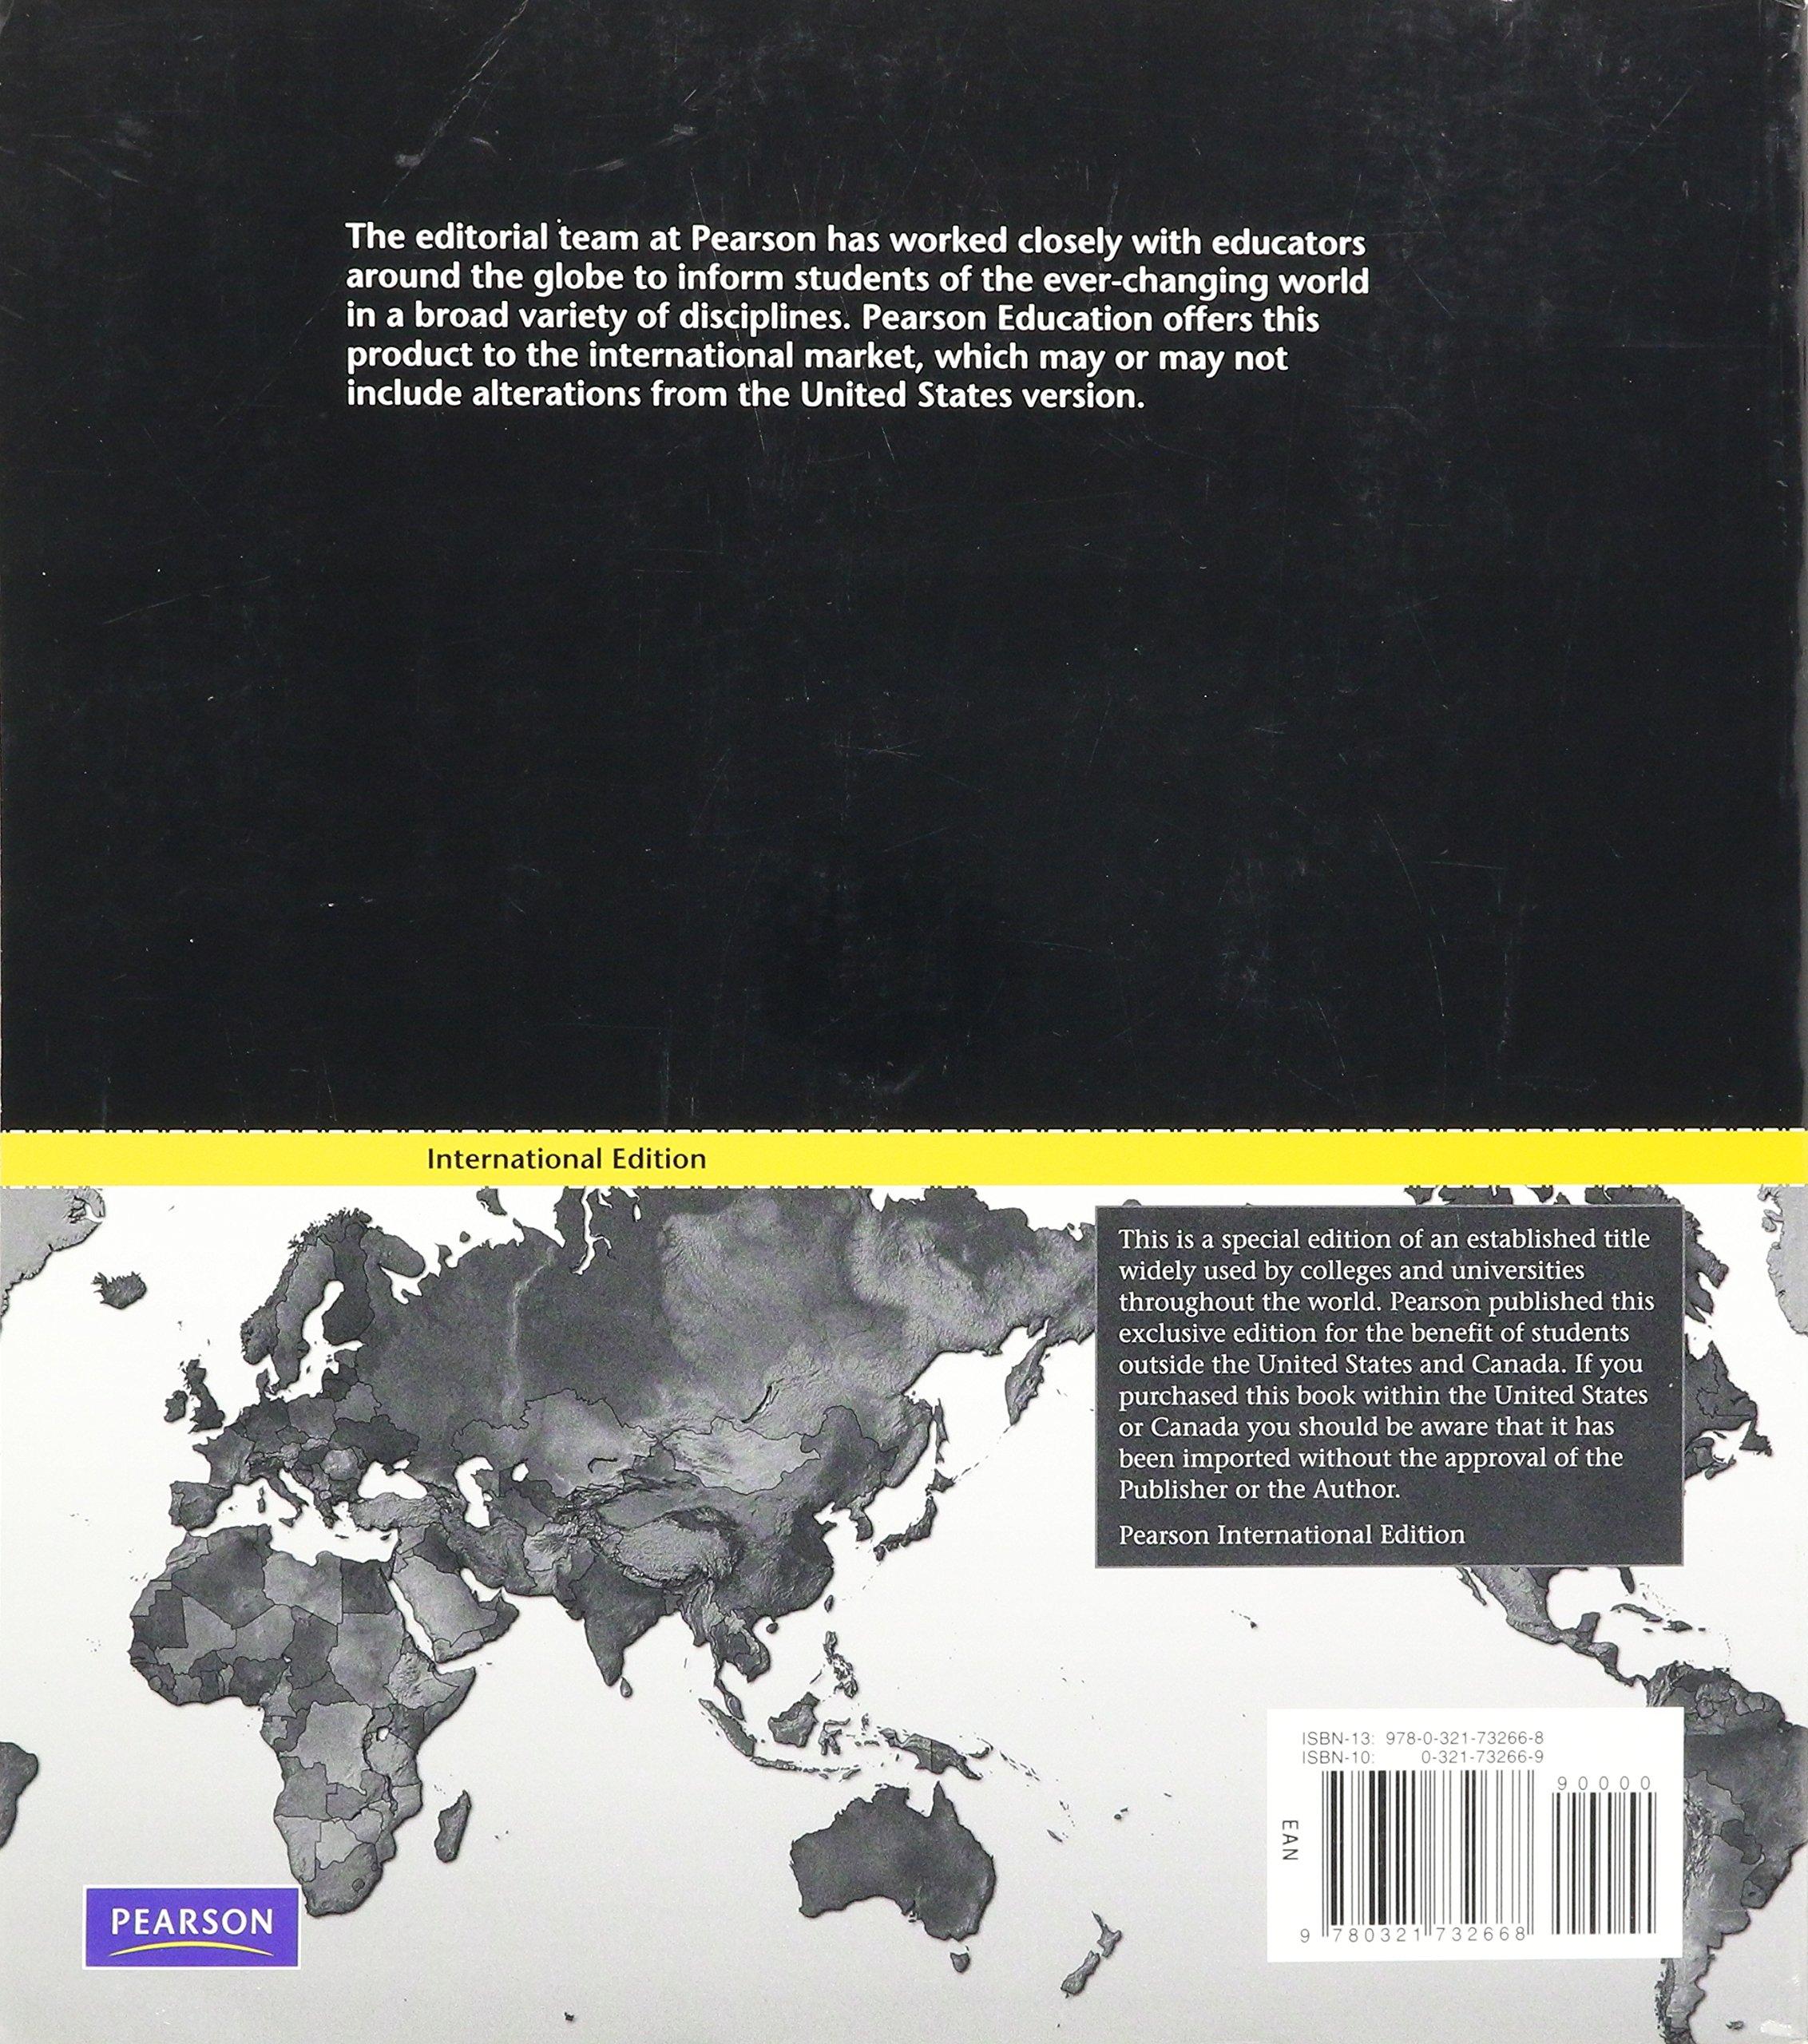 The anatomy coloring book kapit download - Human Anatomy International Version Martini Timmons Tallitsch 9780321732668 Amazon Com Books